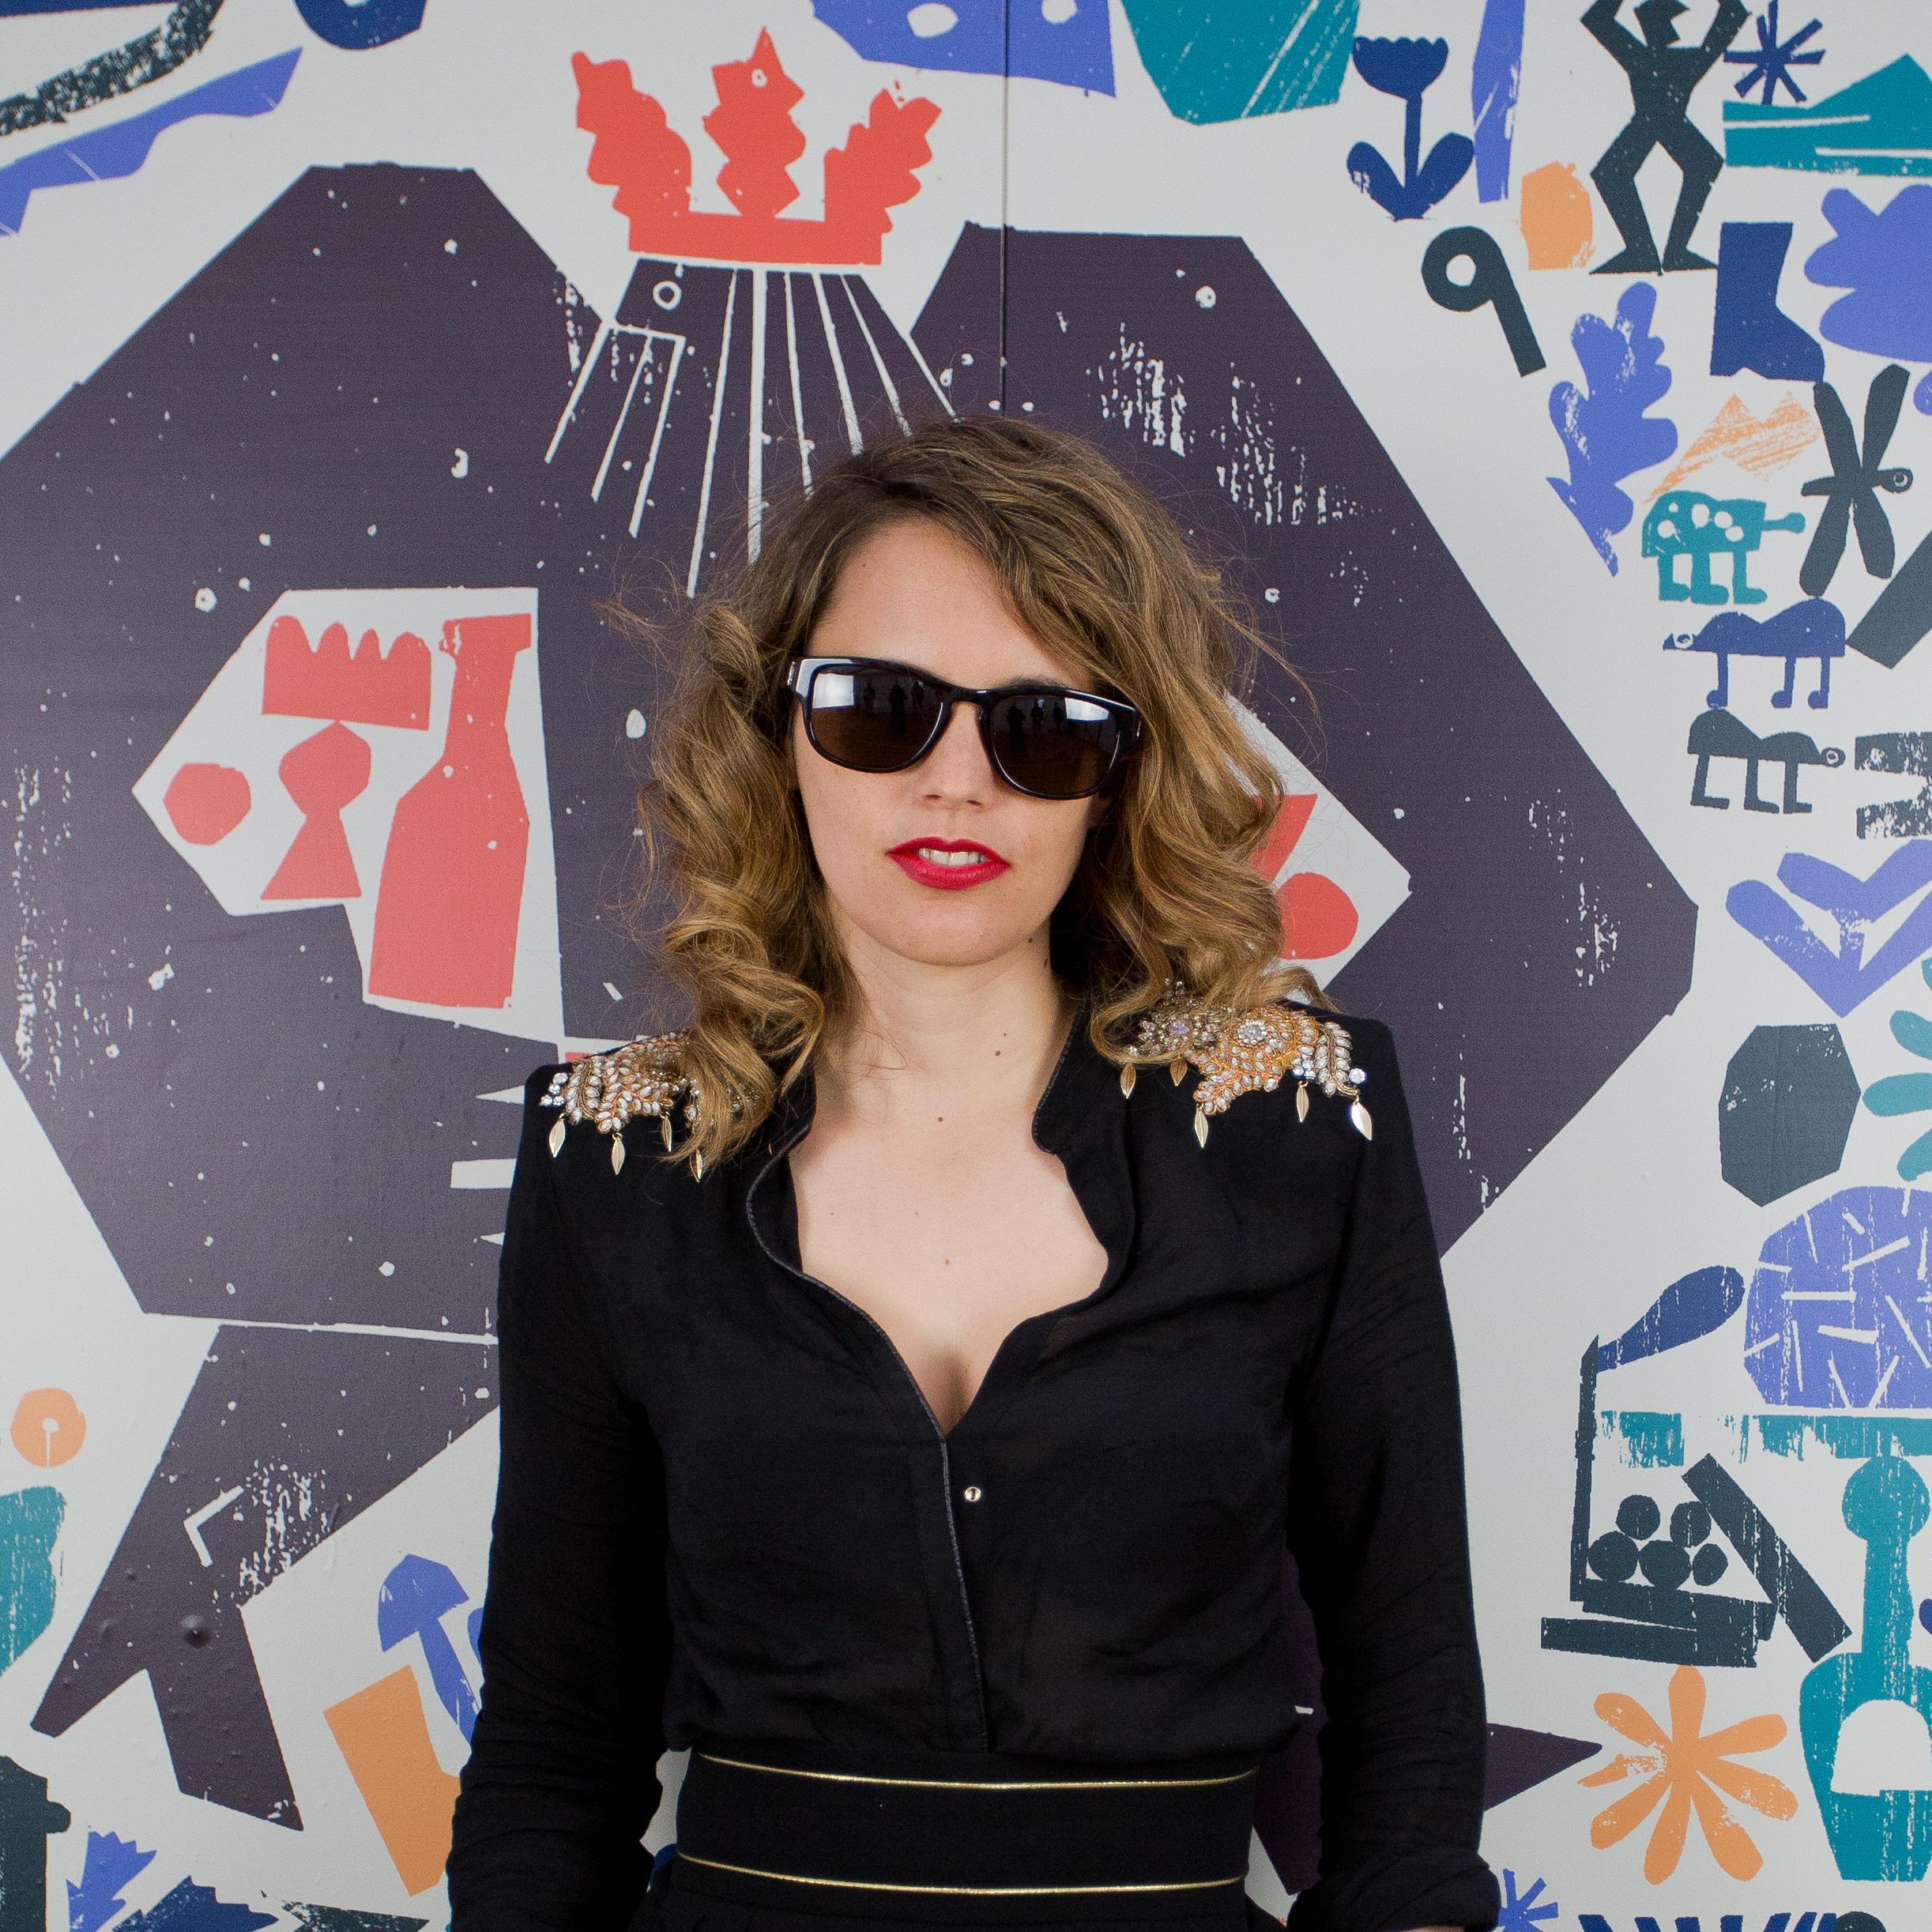 Anna Calvi backstage at Green Man Festival